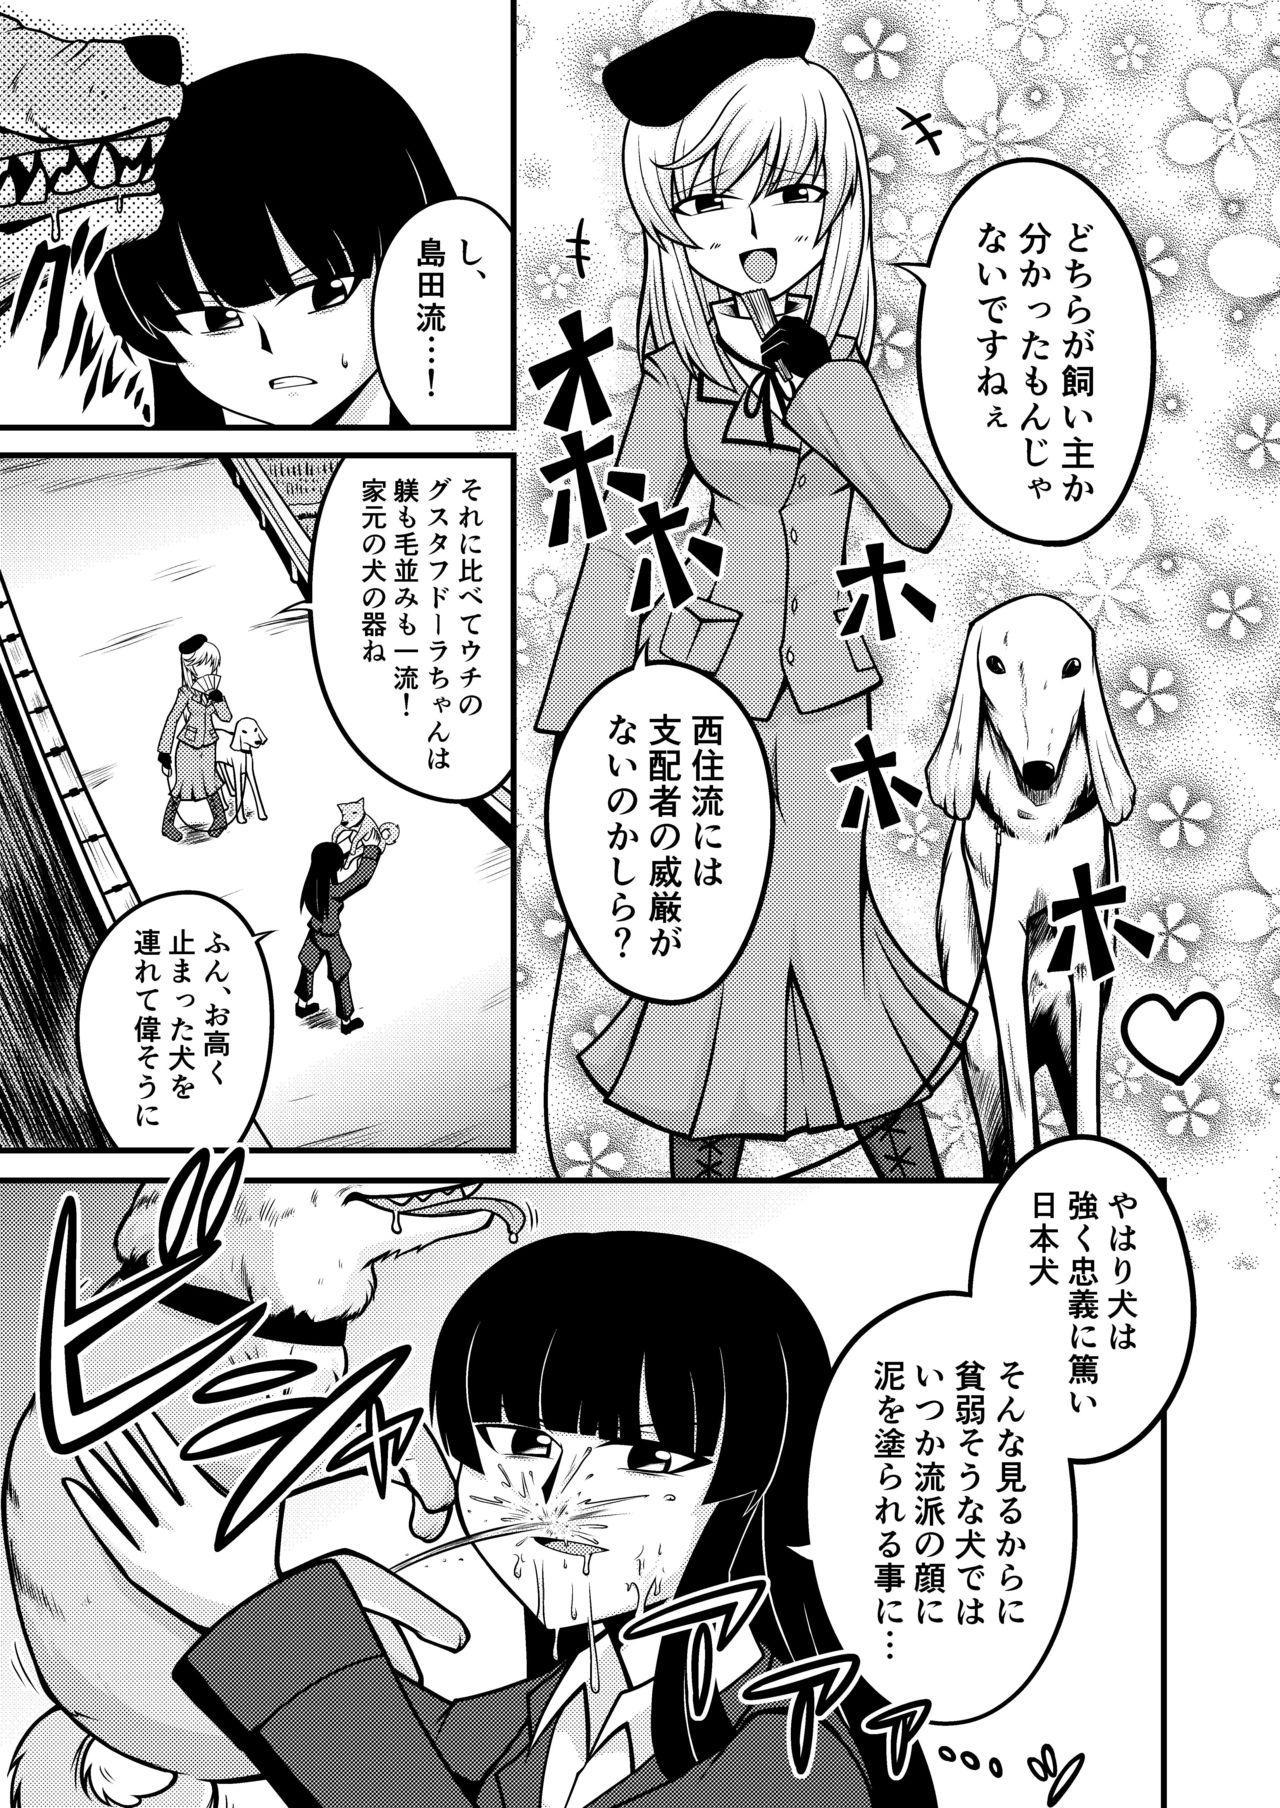 Garupan Iemoto Manga 『Iemoto no Inu』 2